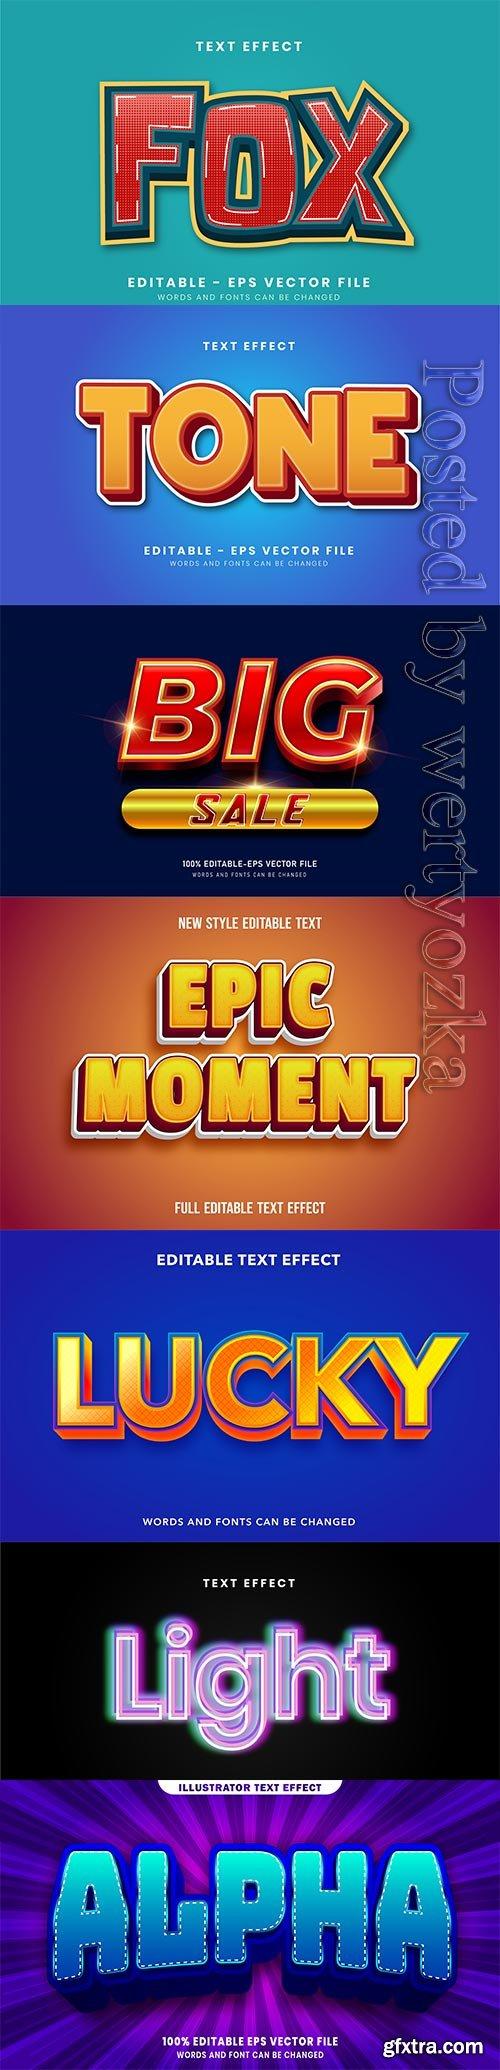 3d editable text style effect vector vol 263